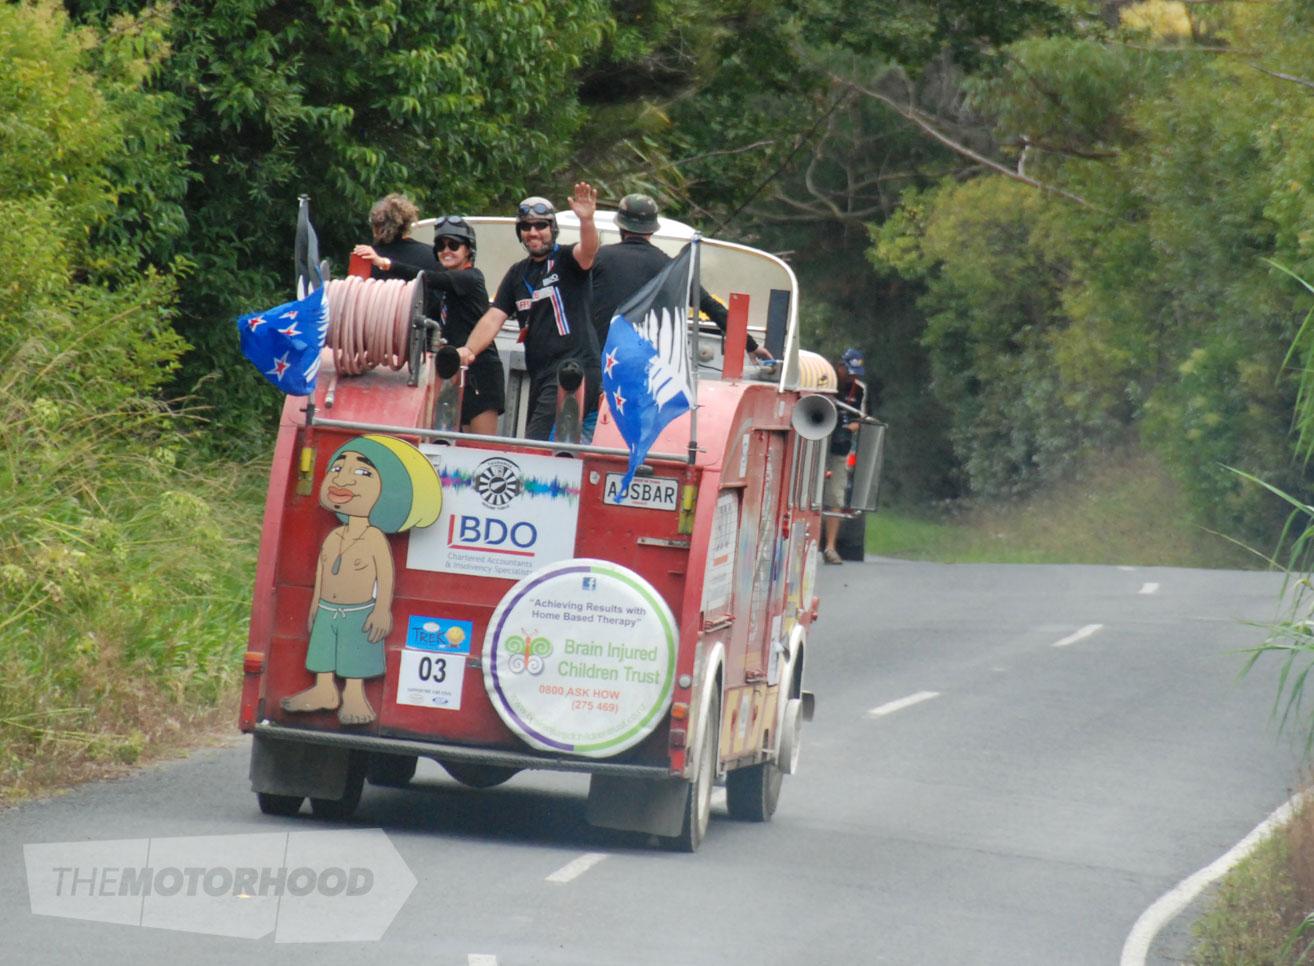 Jacqui Madelin - DSC_5555 elbd road.jpg